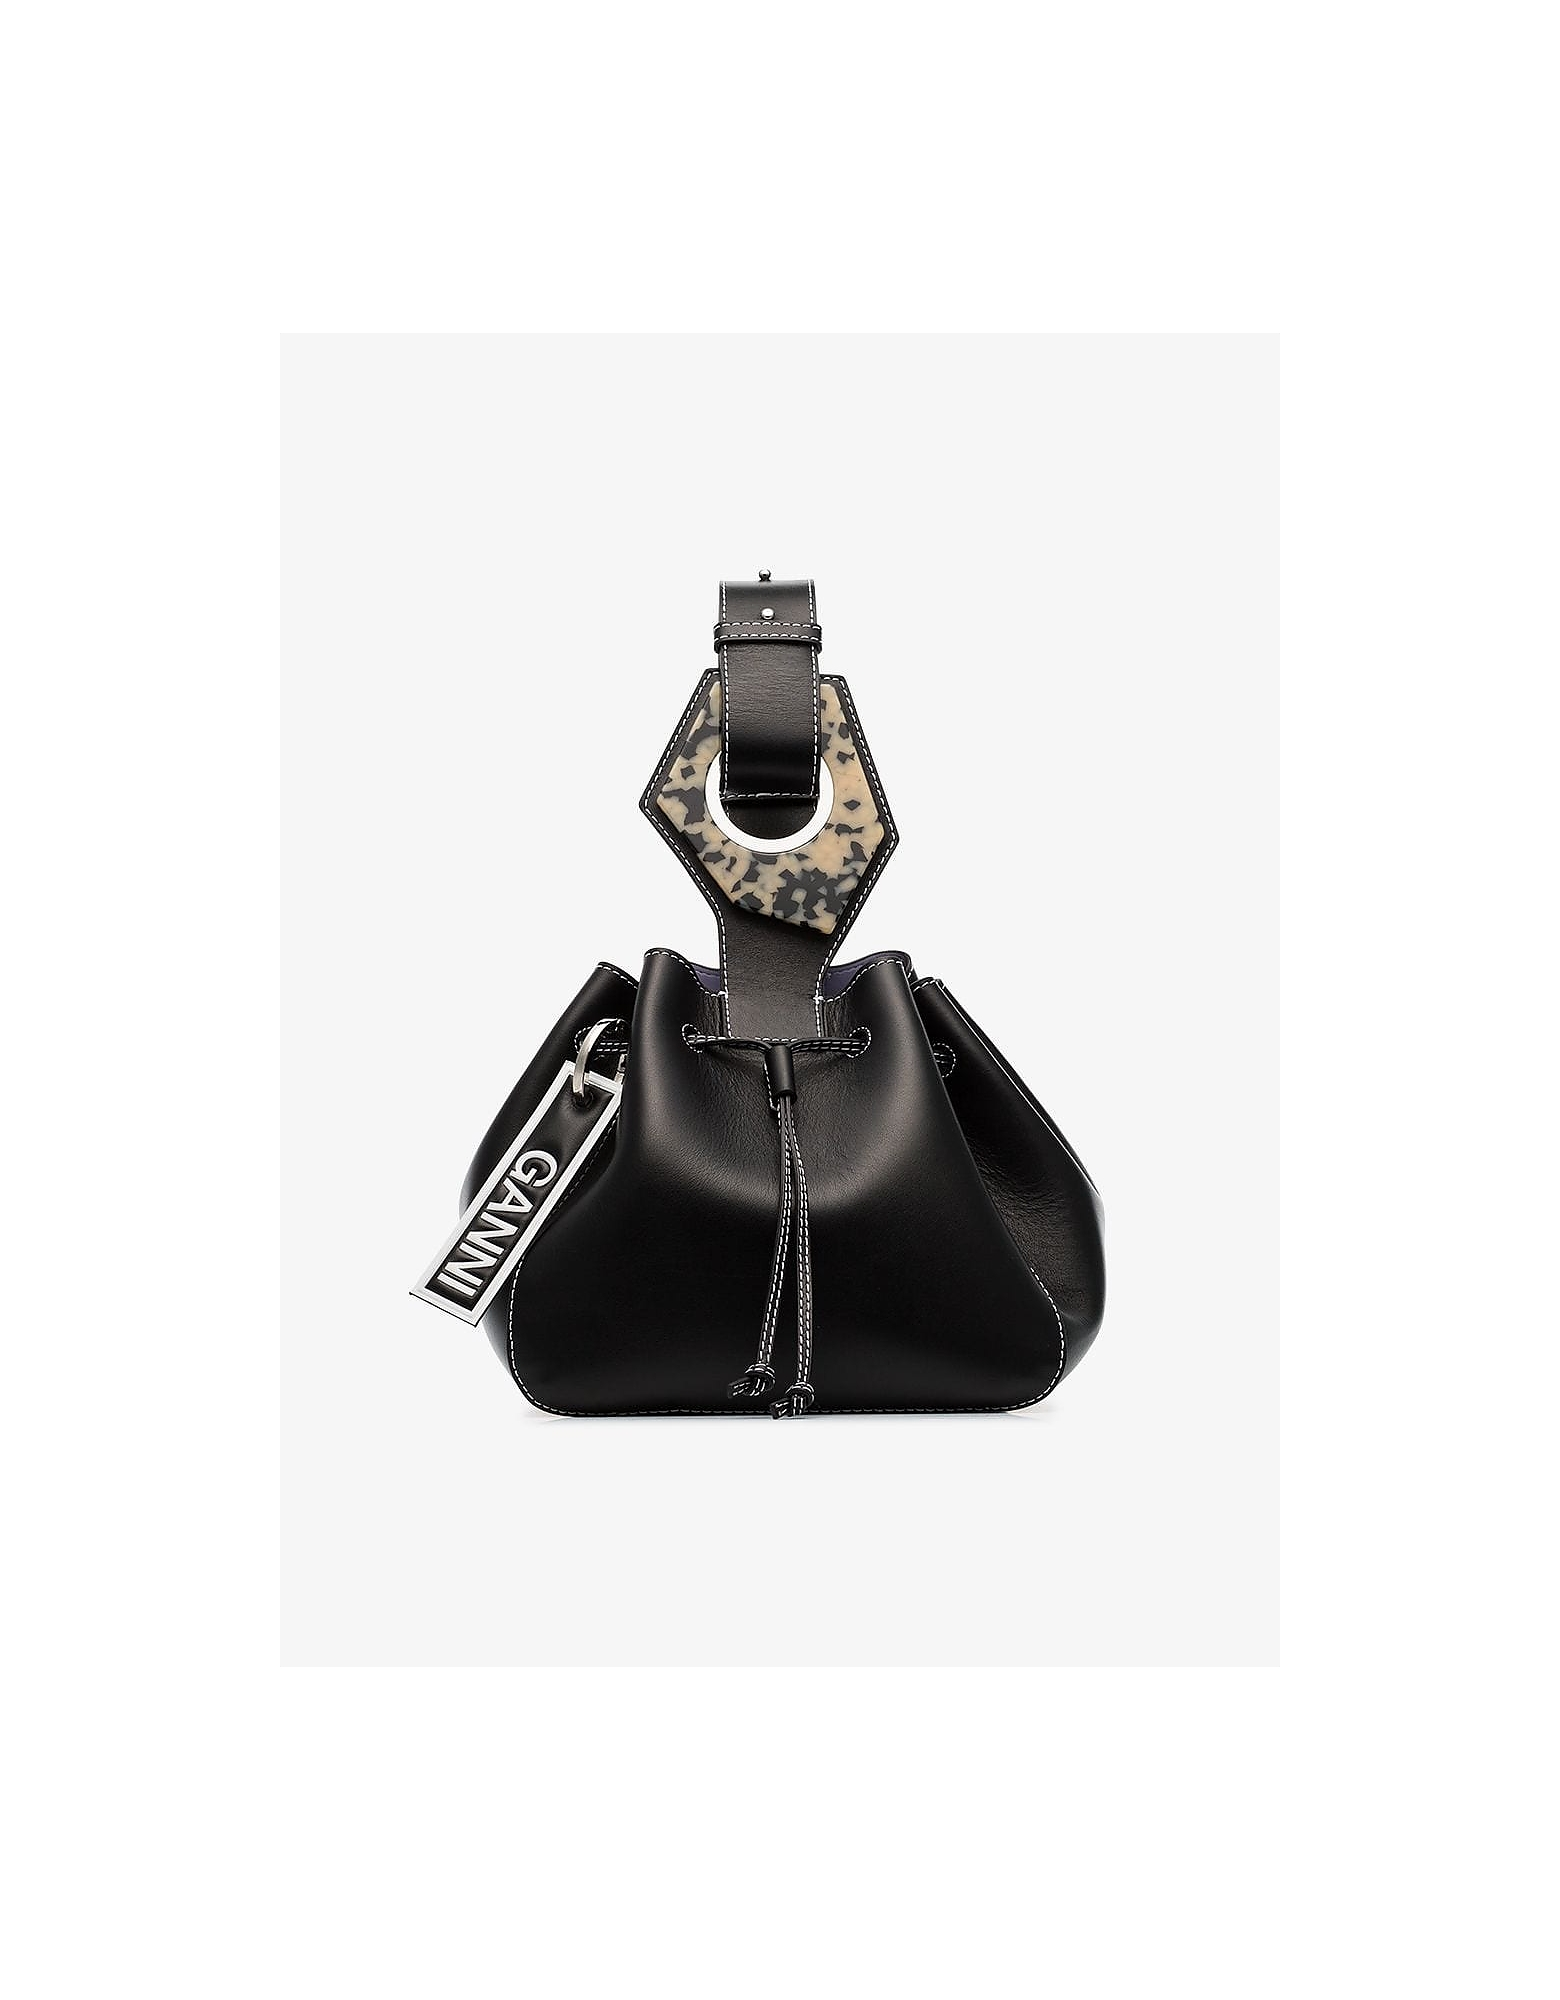 Ganni Designer Handbags, Black Small Leather Drawstring Bag